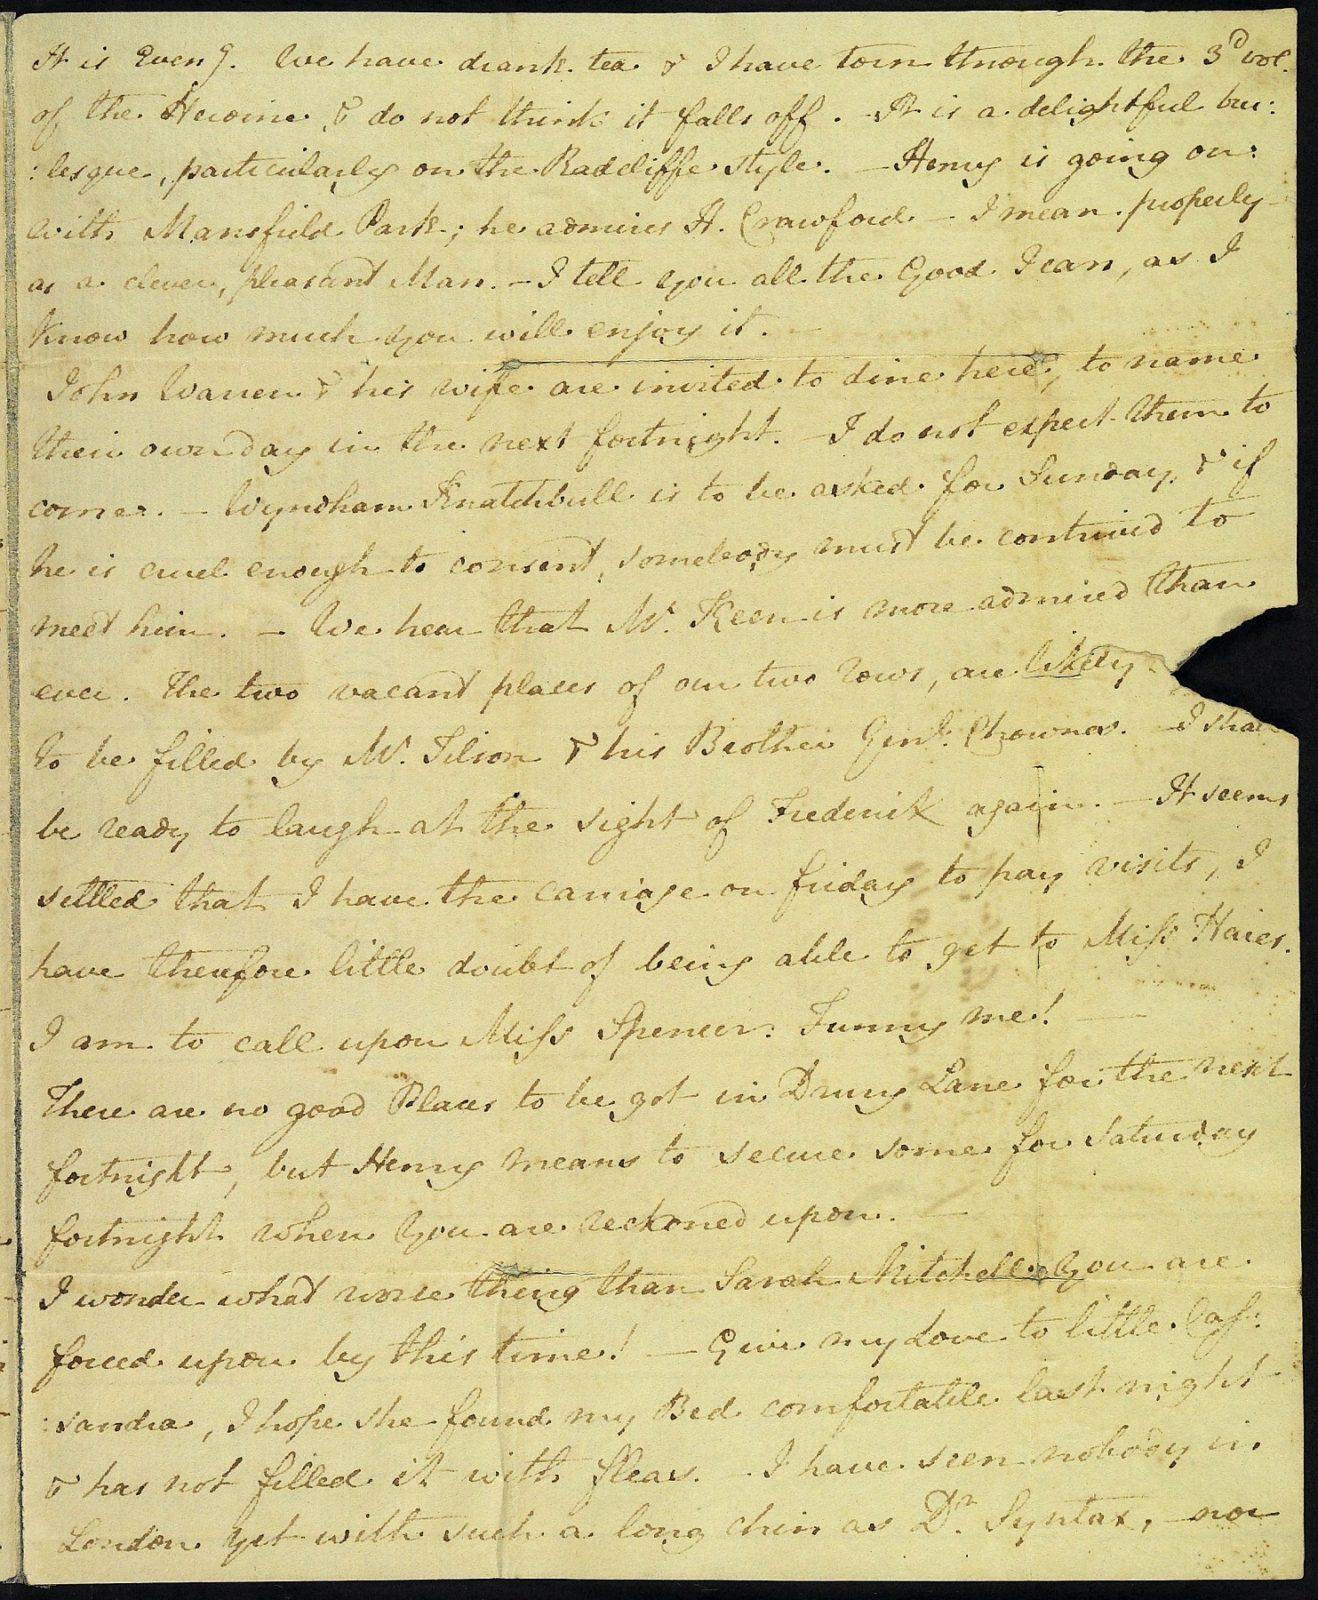 Letter from Jane Austen to Cassandra Austen, 2 March 1814. Page 3